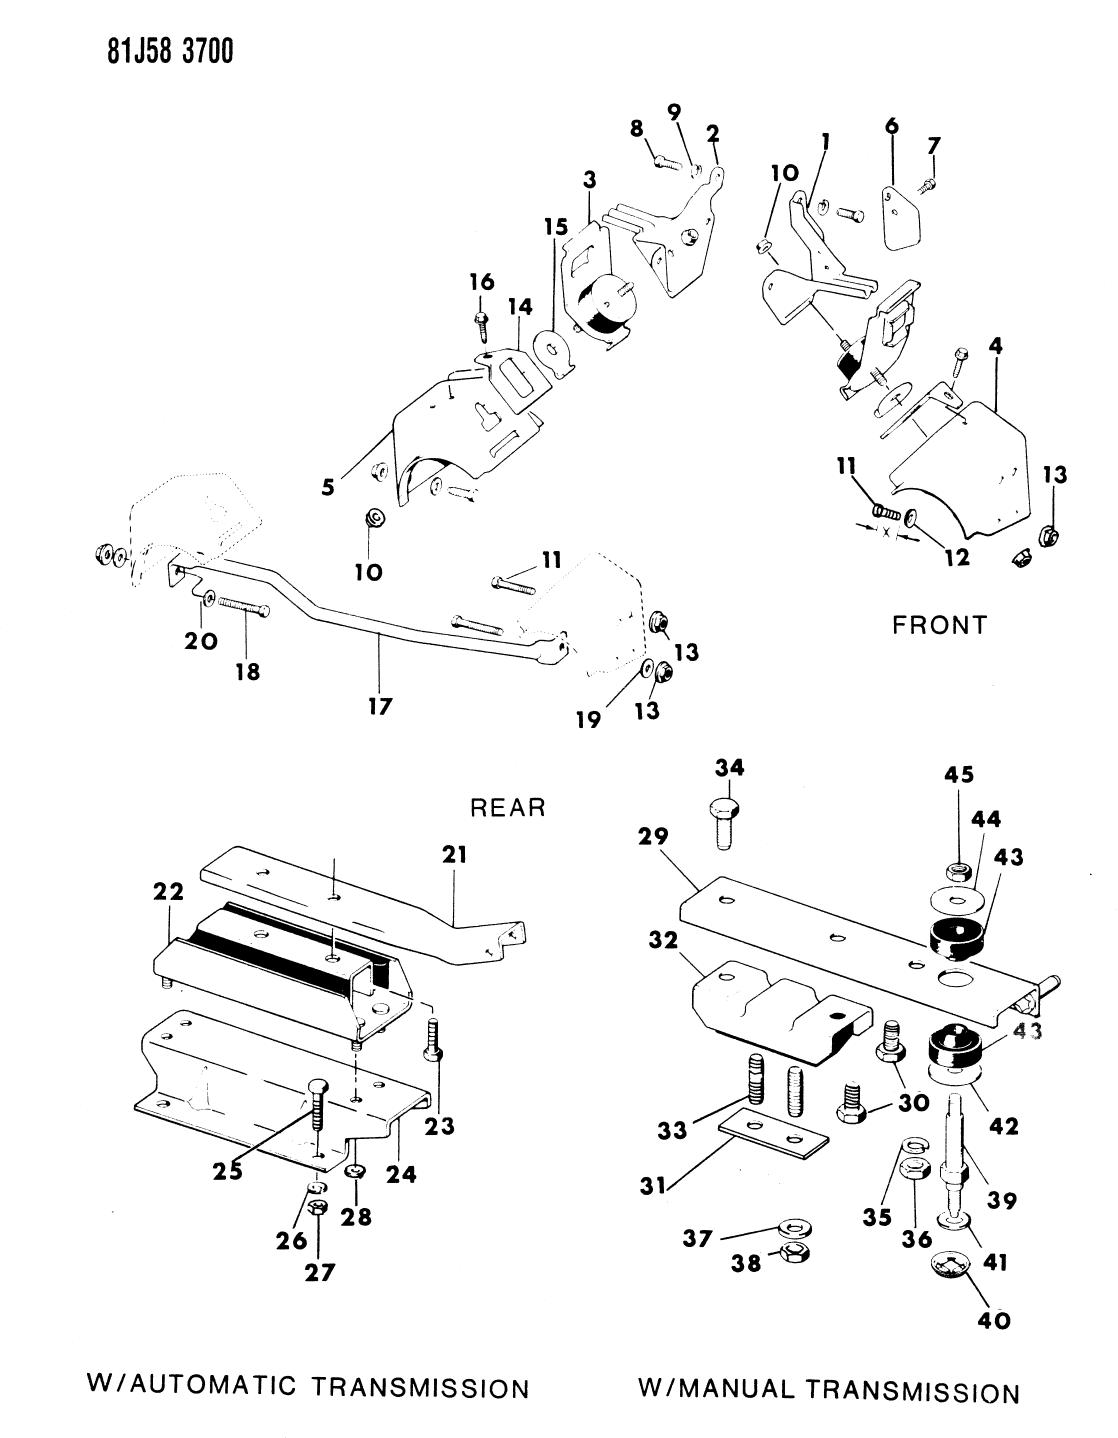 1984 Jeep Wrangler Engine Mounting Mopar Parts Giant 4 0l Bellhousing Diagram Thumbnail 2